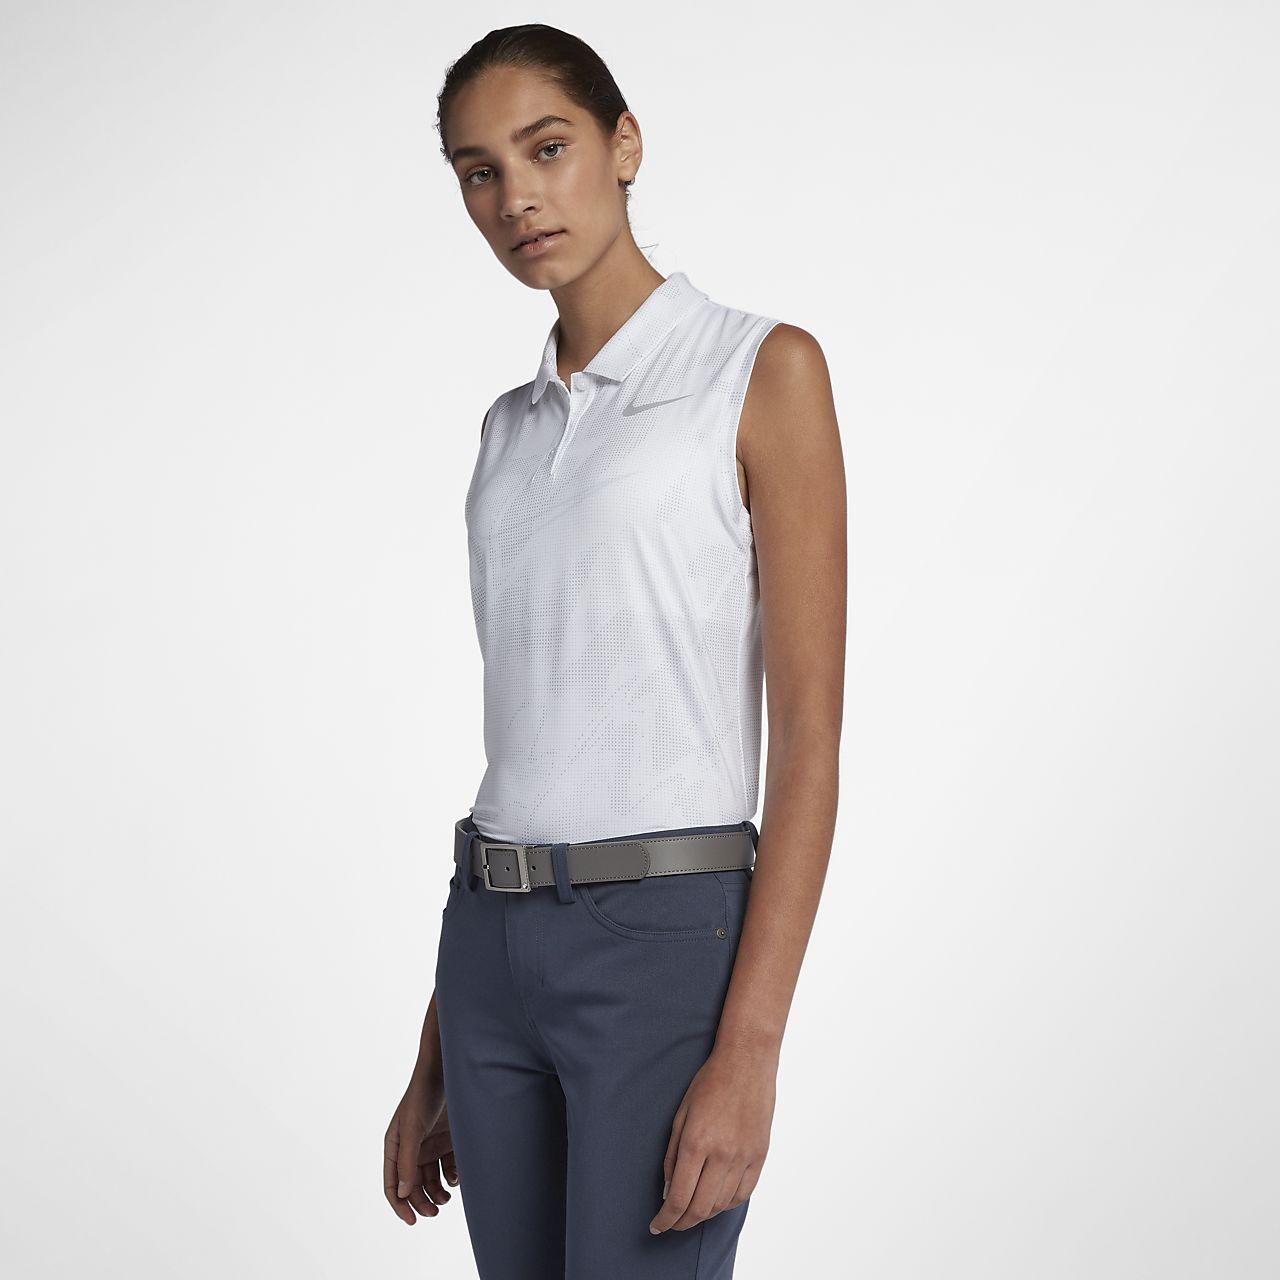 Ladies Nike Sleeveless Golf Shirts Joe Maloy